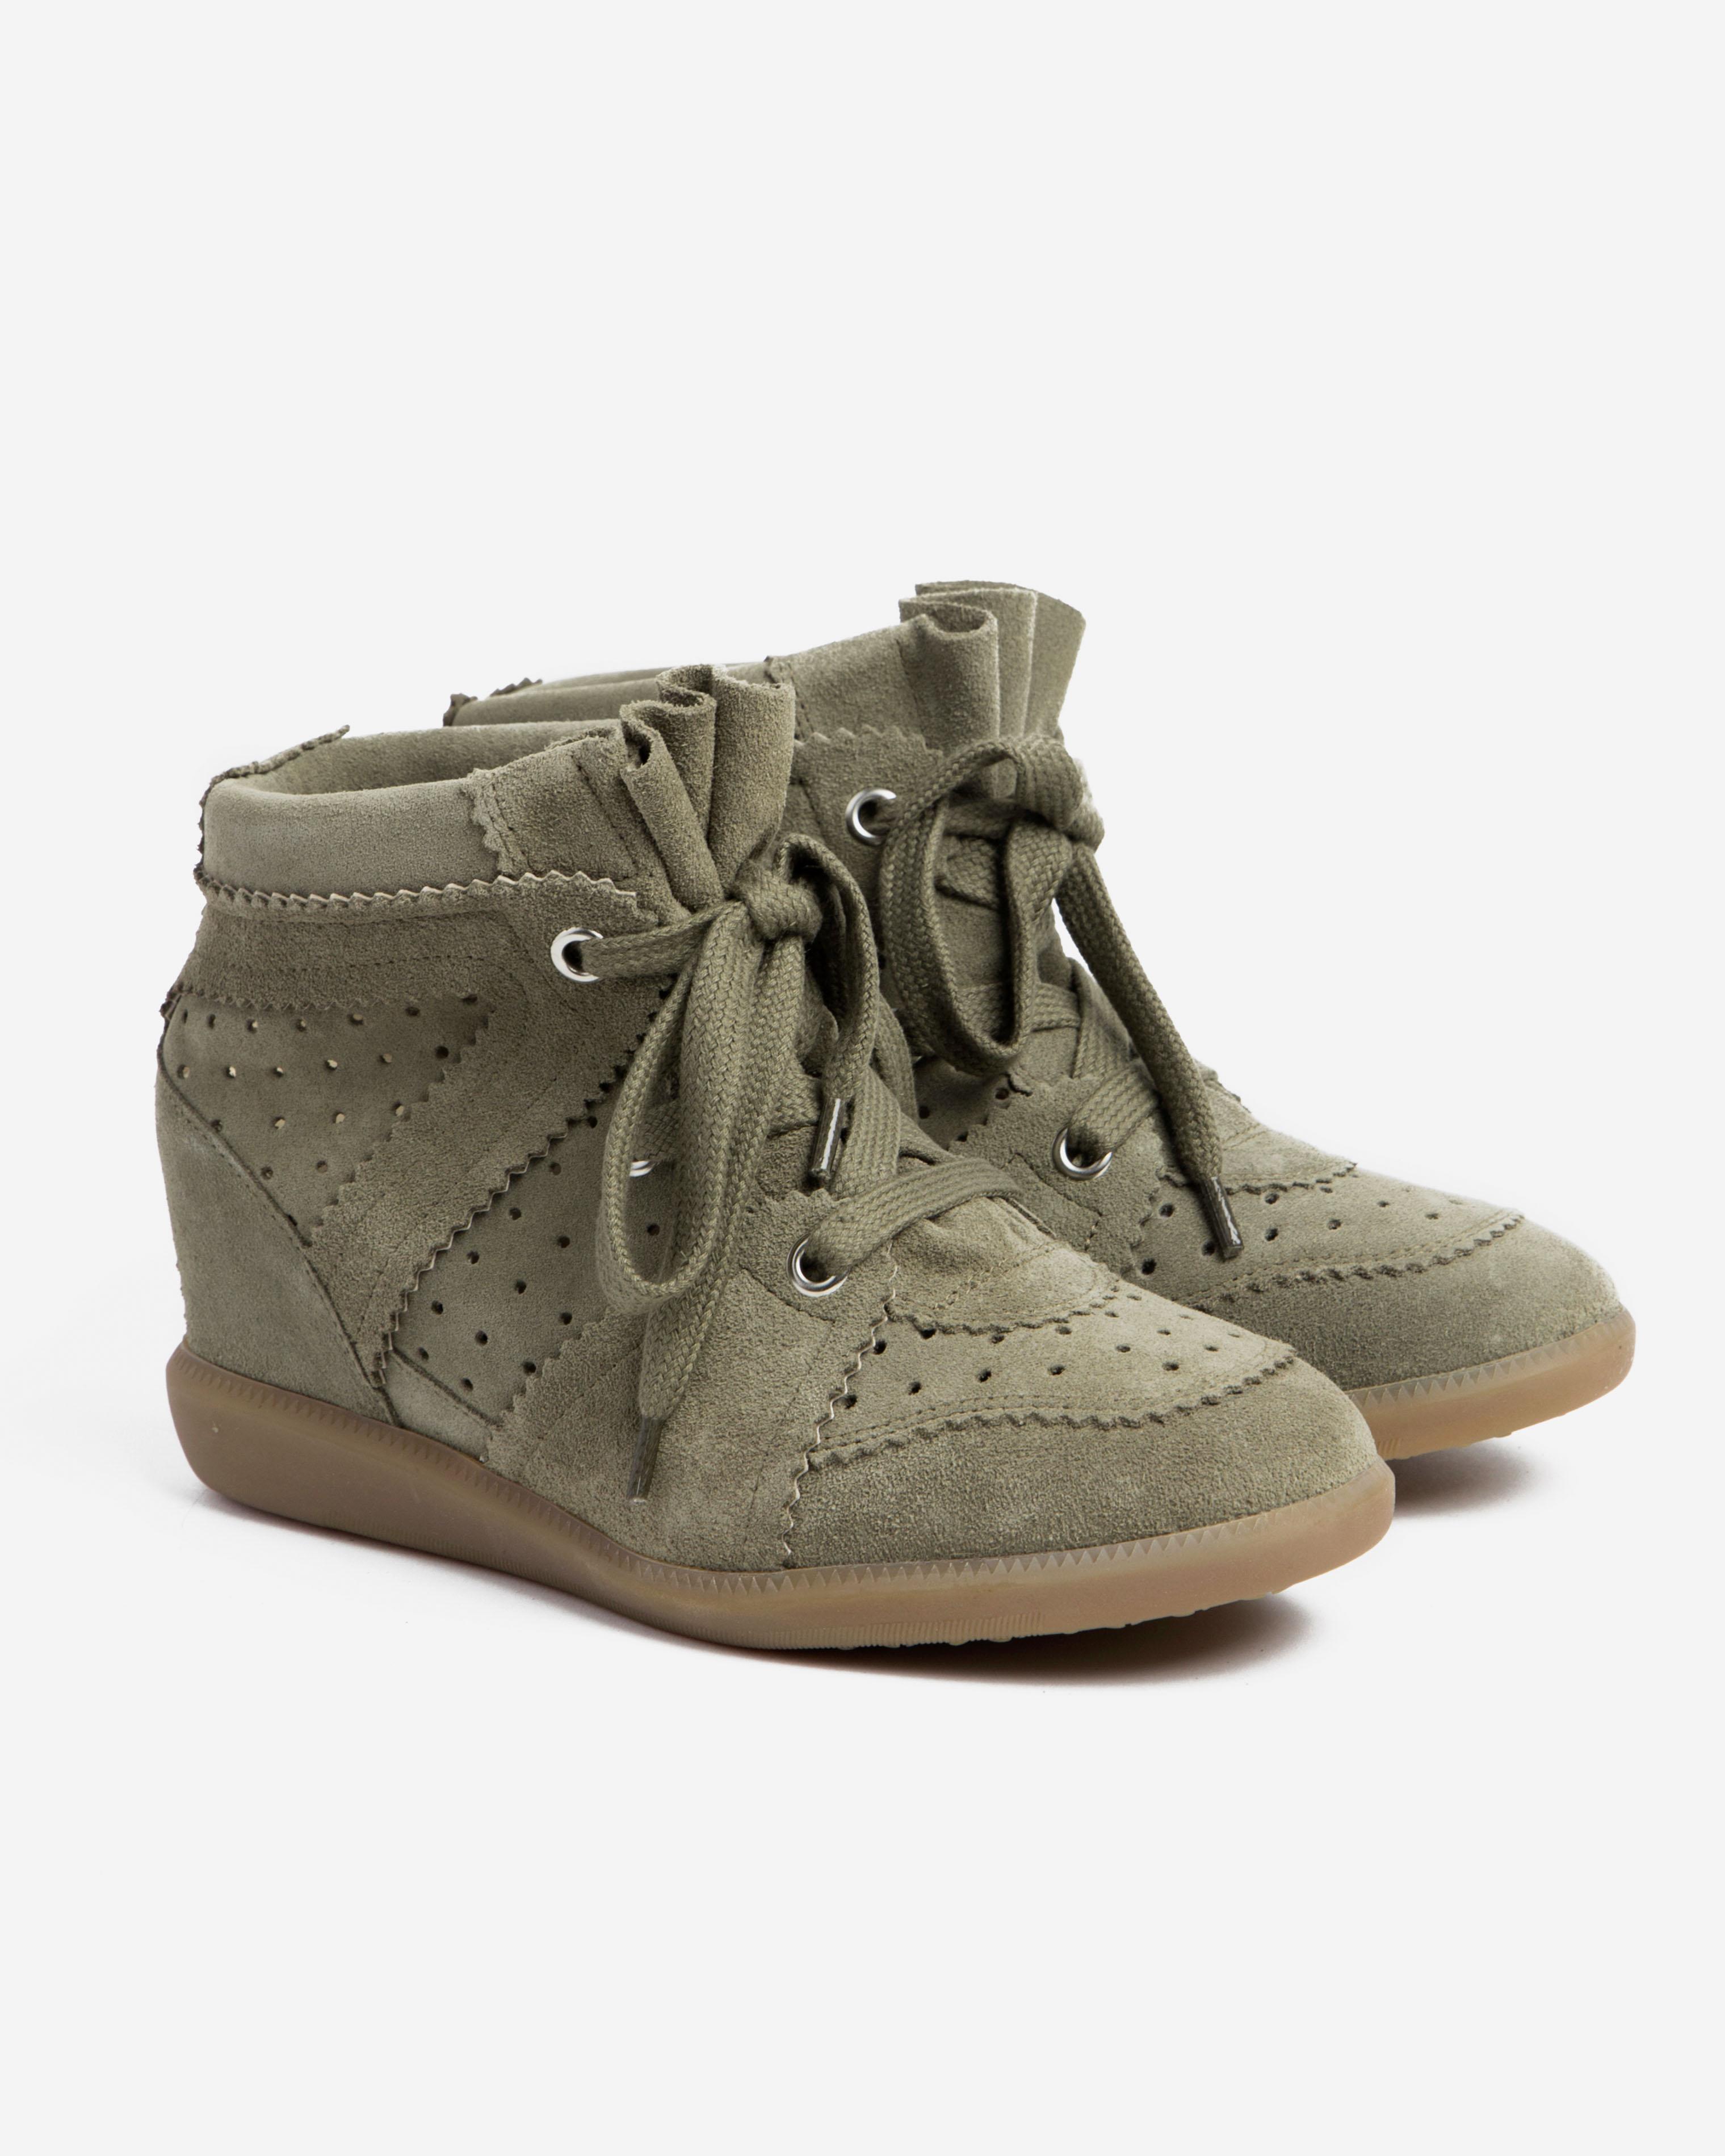 Isabel Marant Etoile 6 - Bobby Sneaker - Taupe